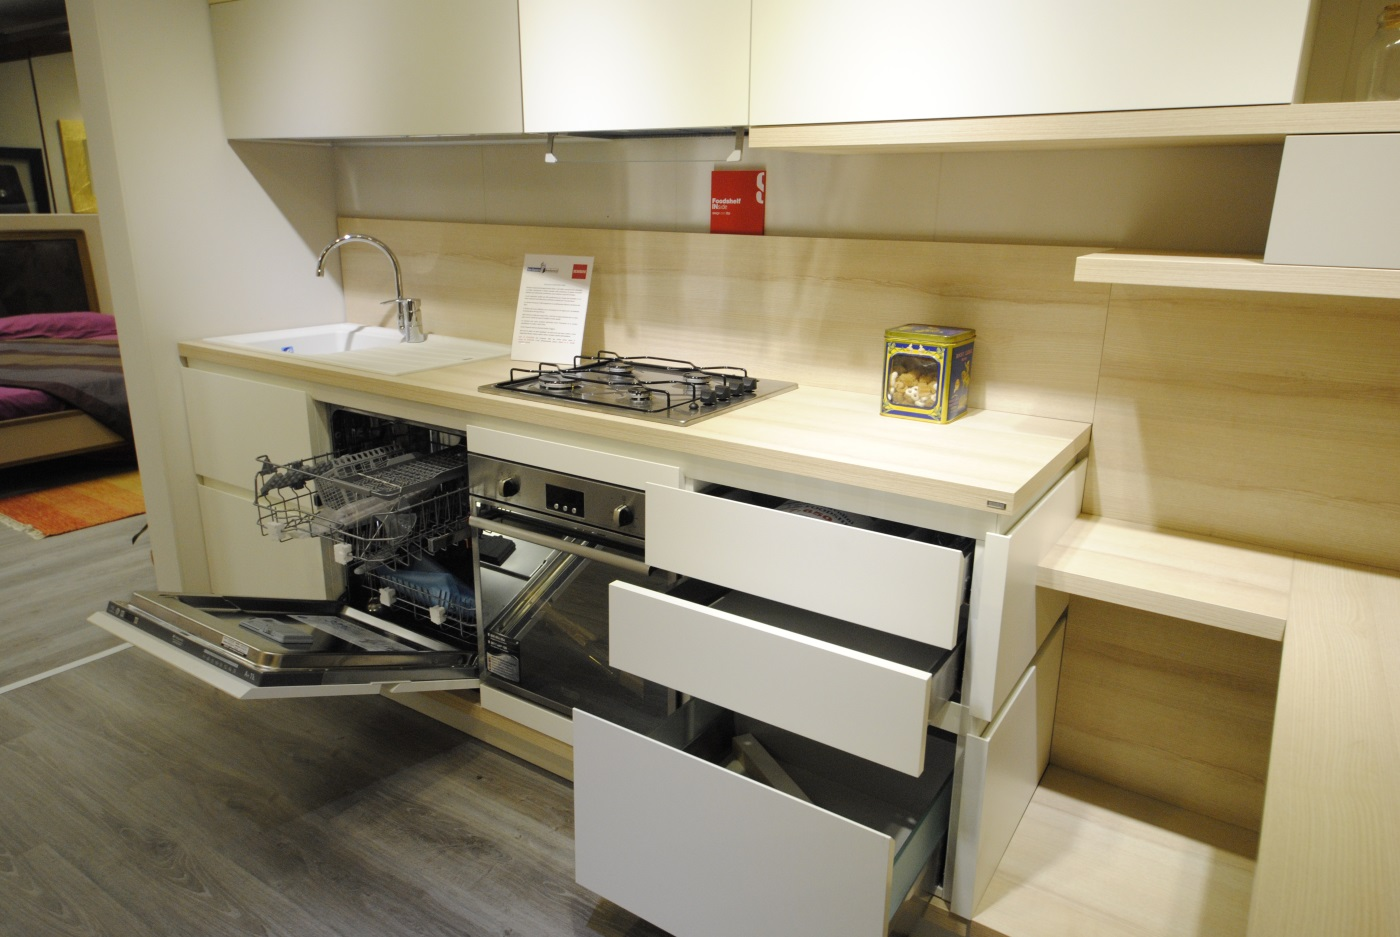 Offerta Cucina Scavolini modello Foodshelf Inside - San Gaetano ...